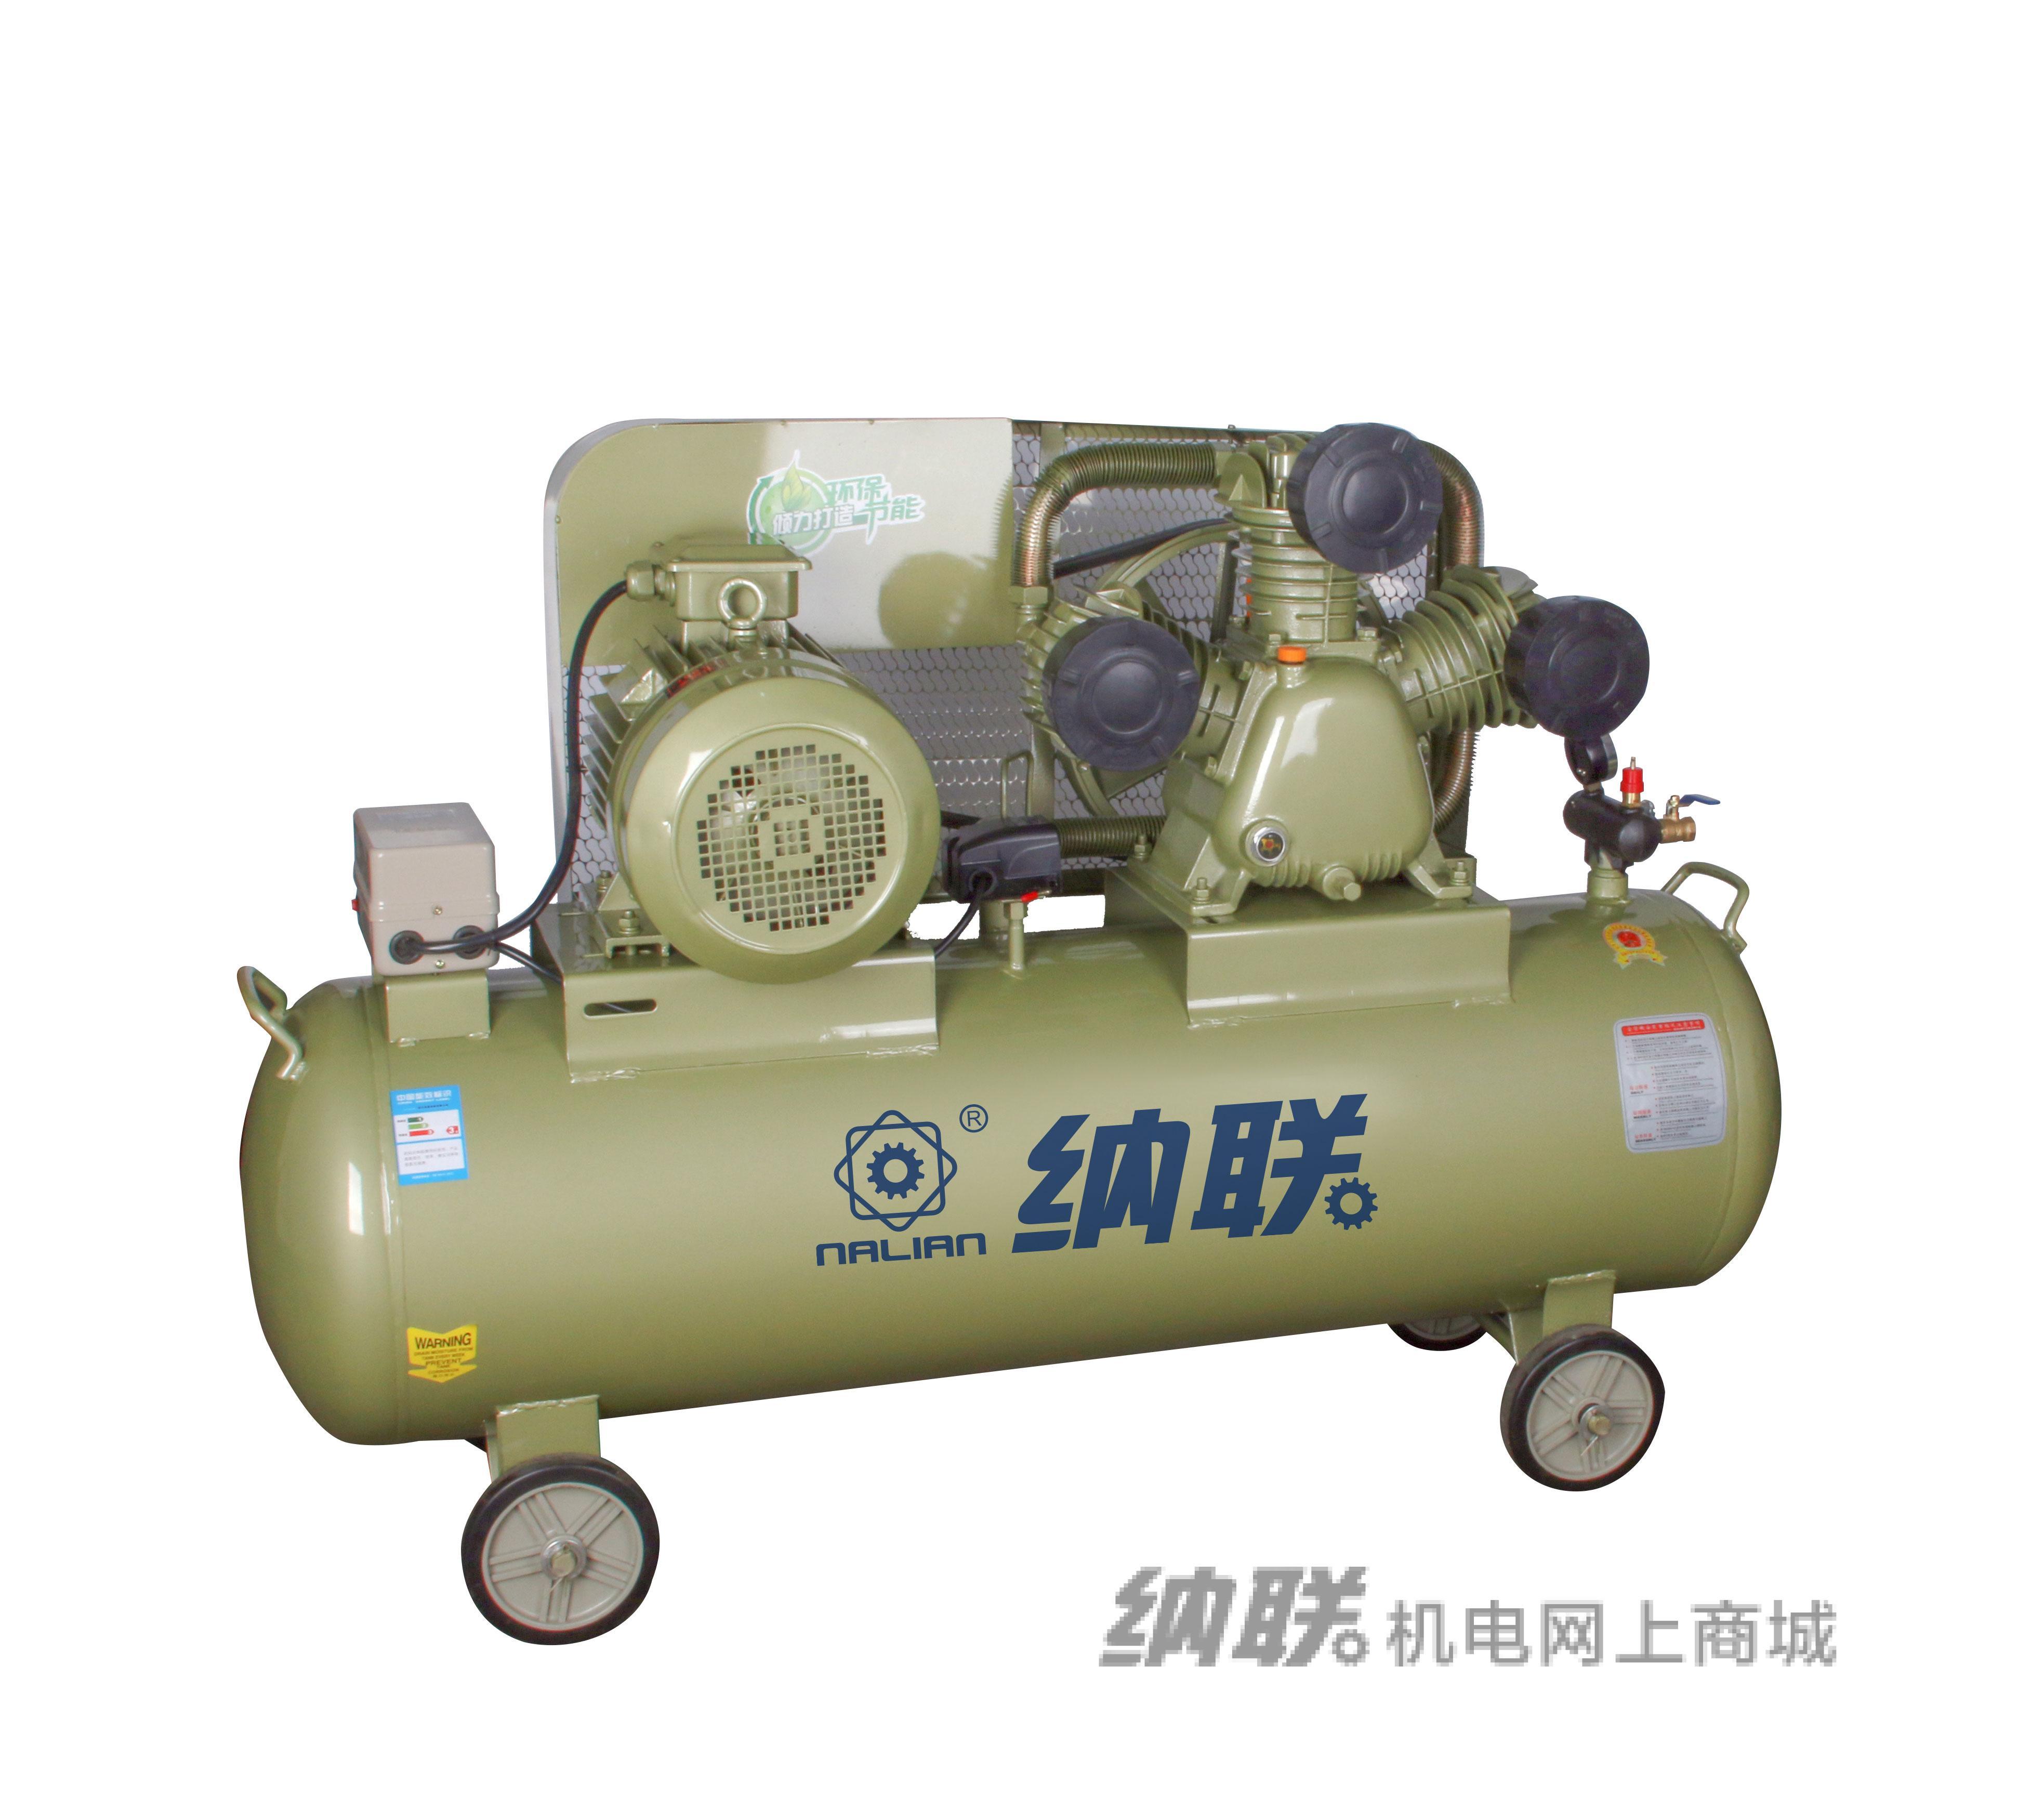 纳联机电 V型空压机-V-0.25/8  三